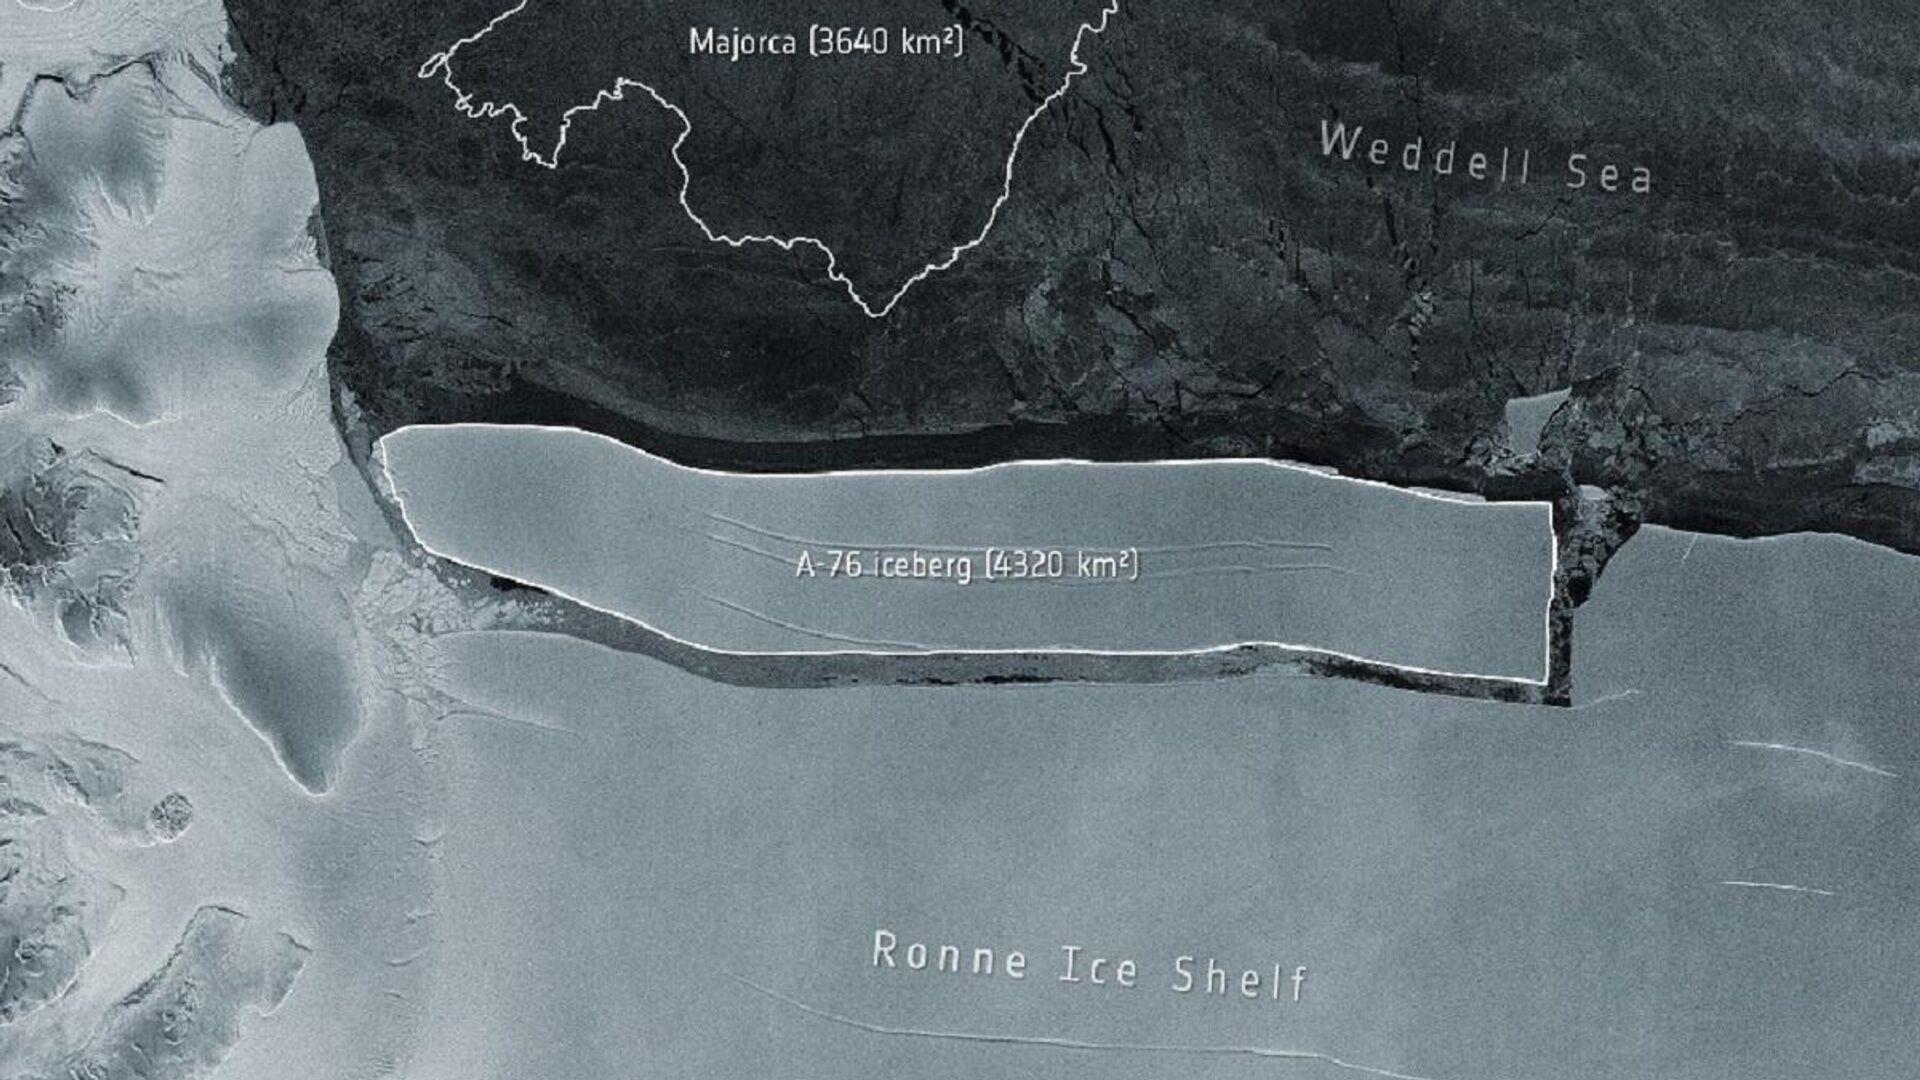 El iceberg A-76 - Sputnik Mundo, 1920, 23.05.2021